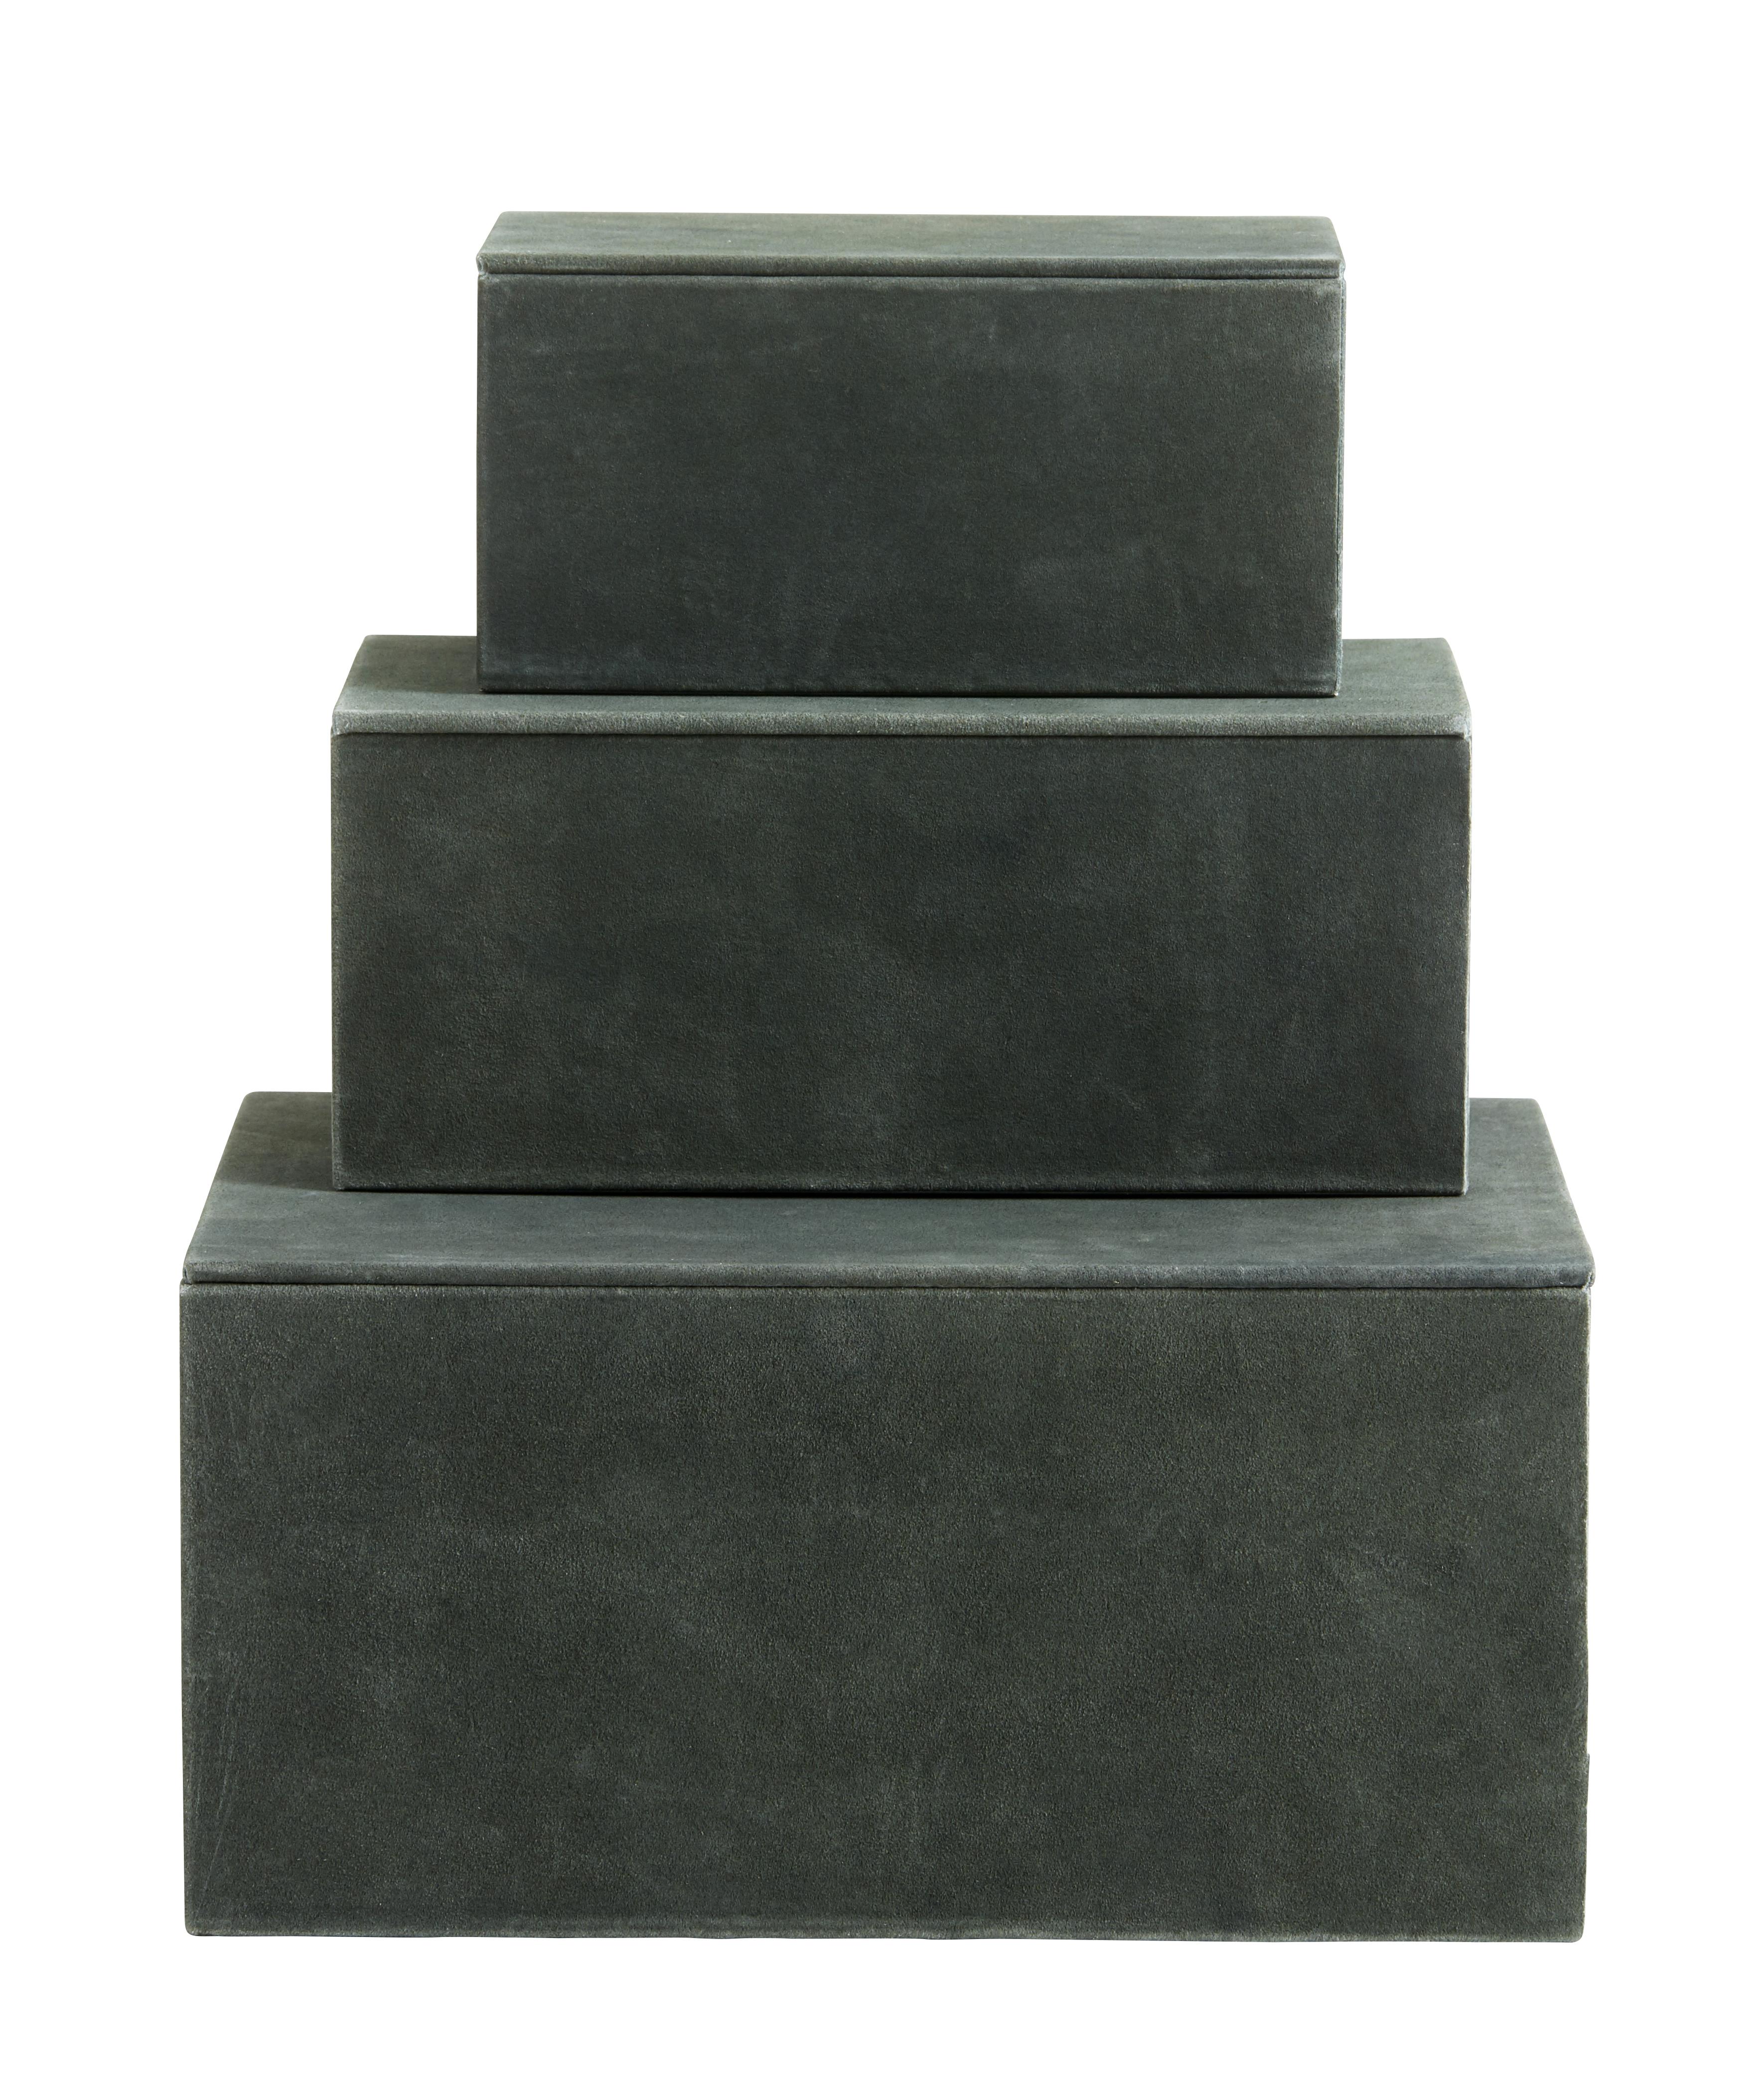 Box Grön Läder Set av 3